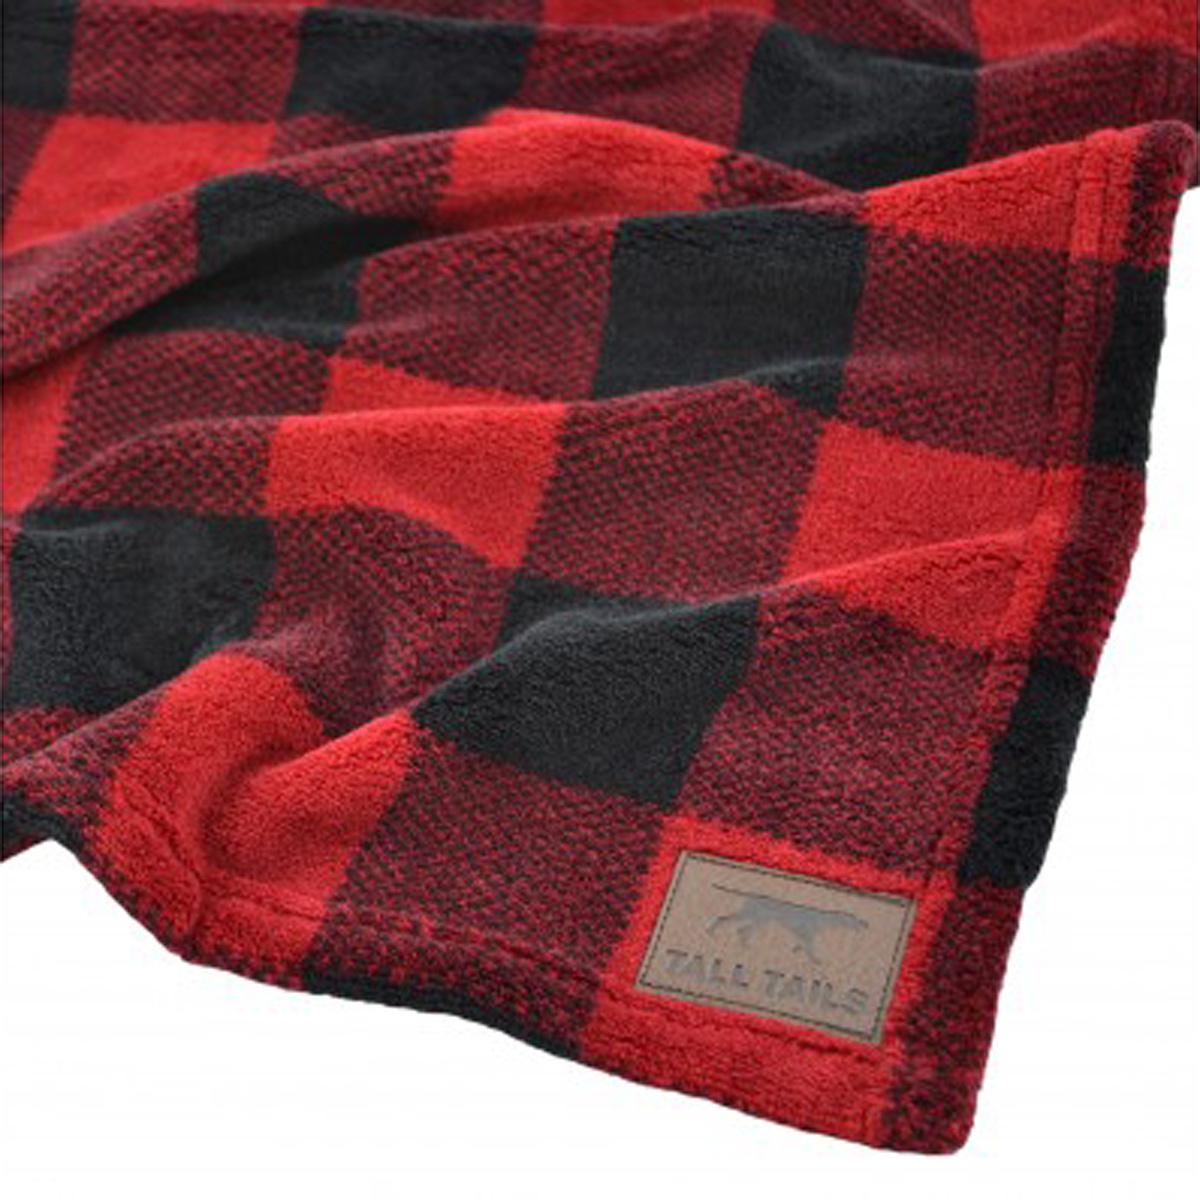 Tall Tails Fleece Dog Blanket - Hunters Plaid